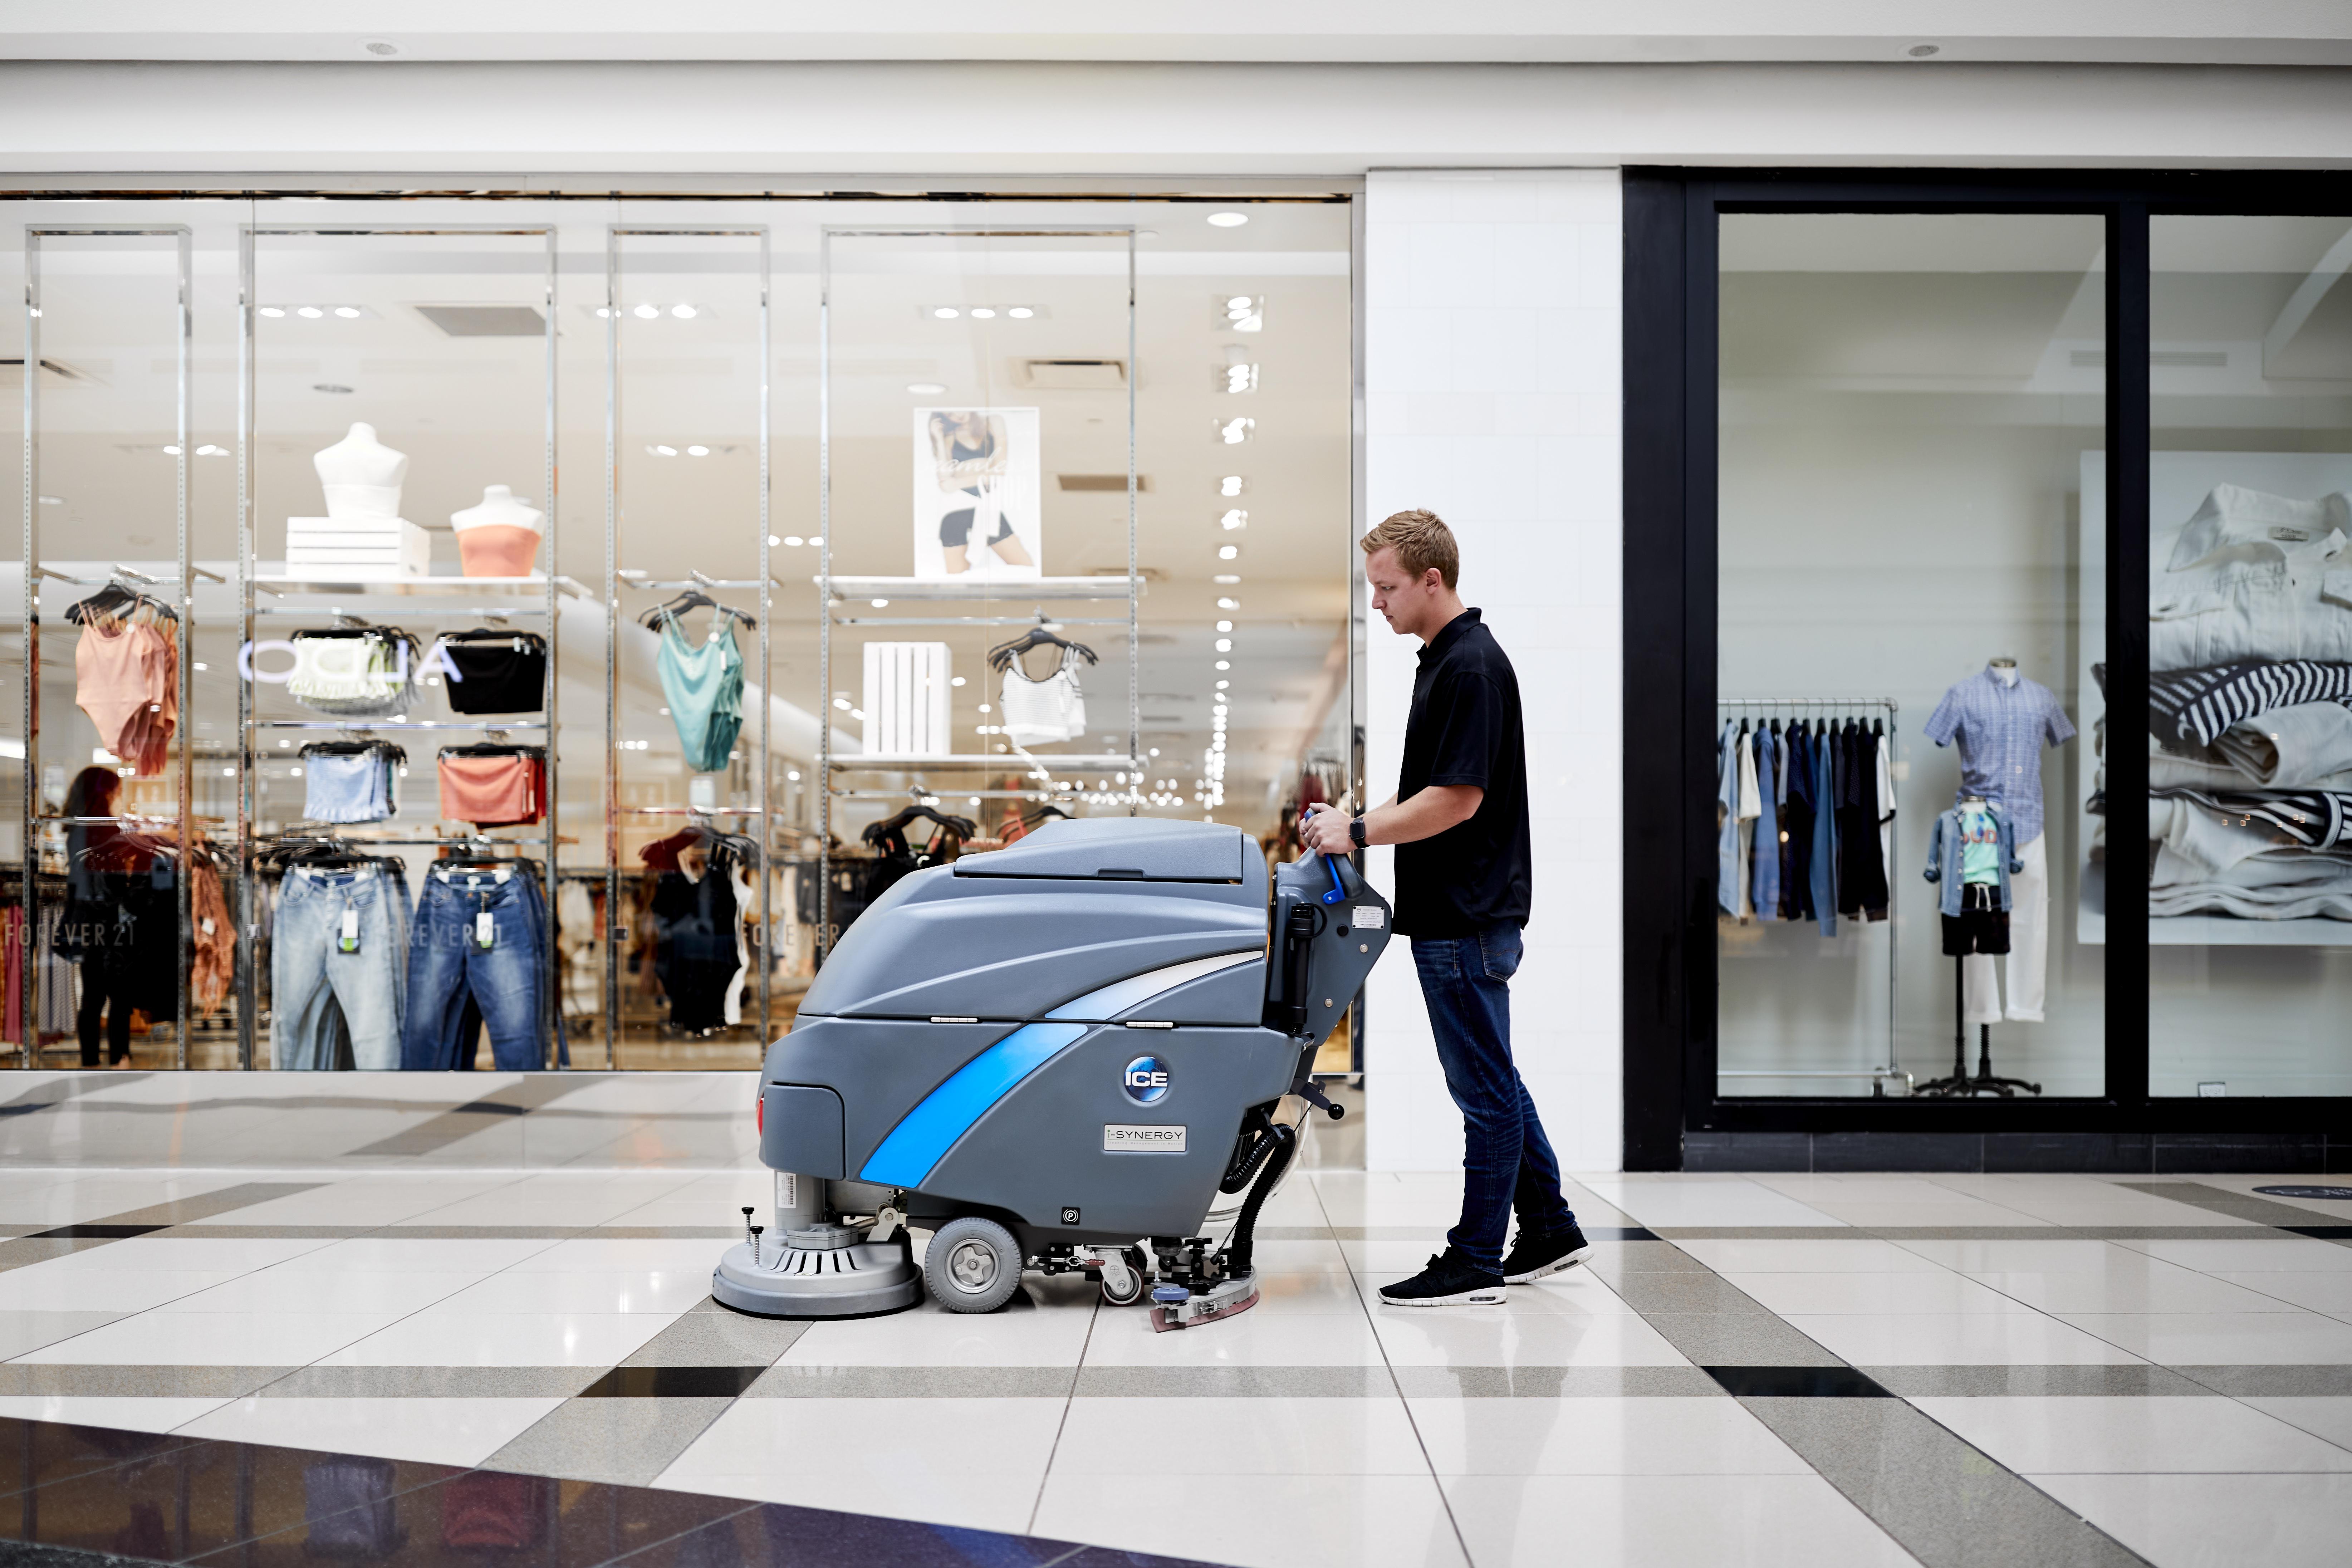 Machine operator pushing the i20btl scrubber through retail mall